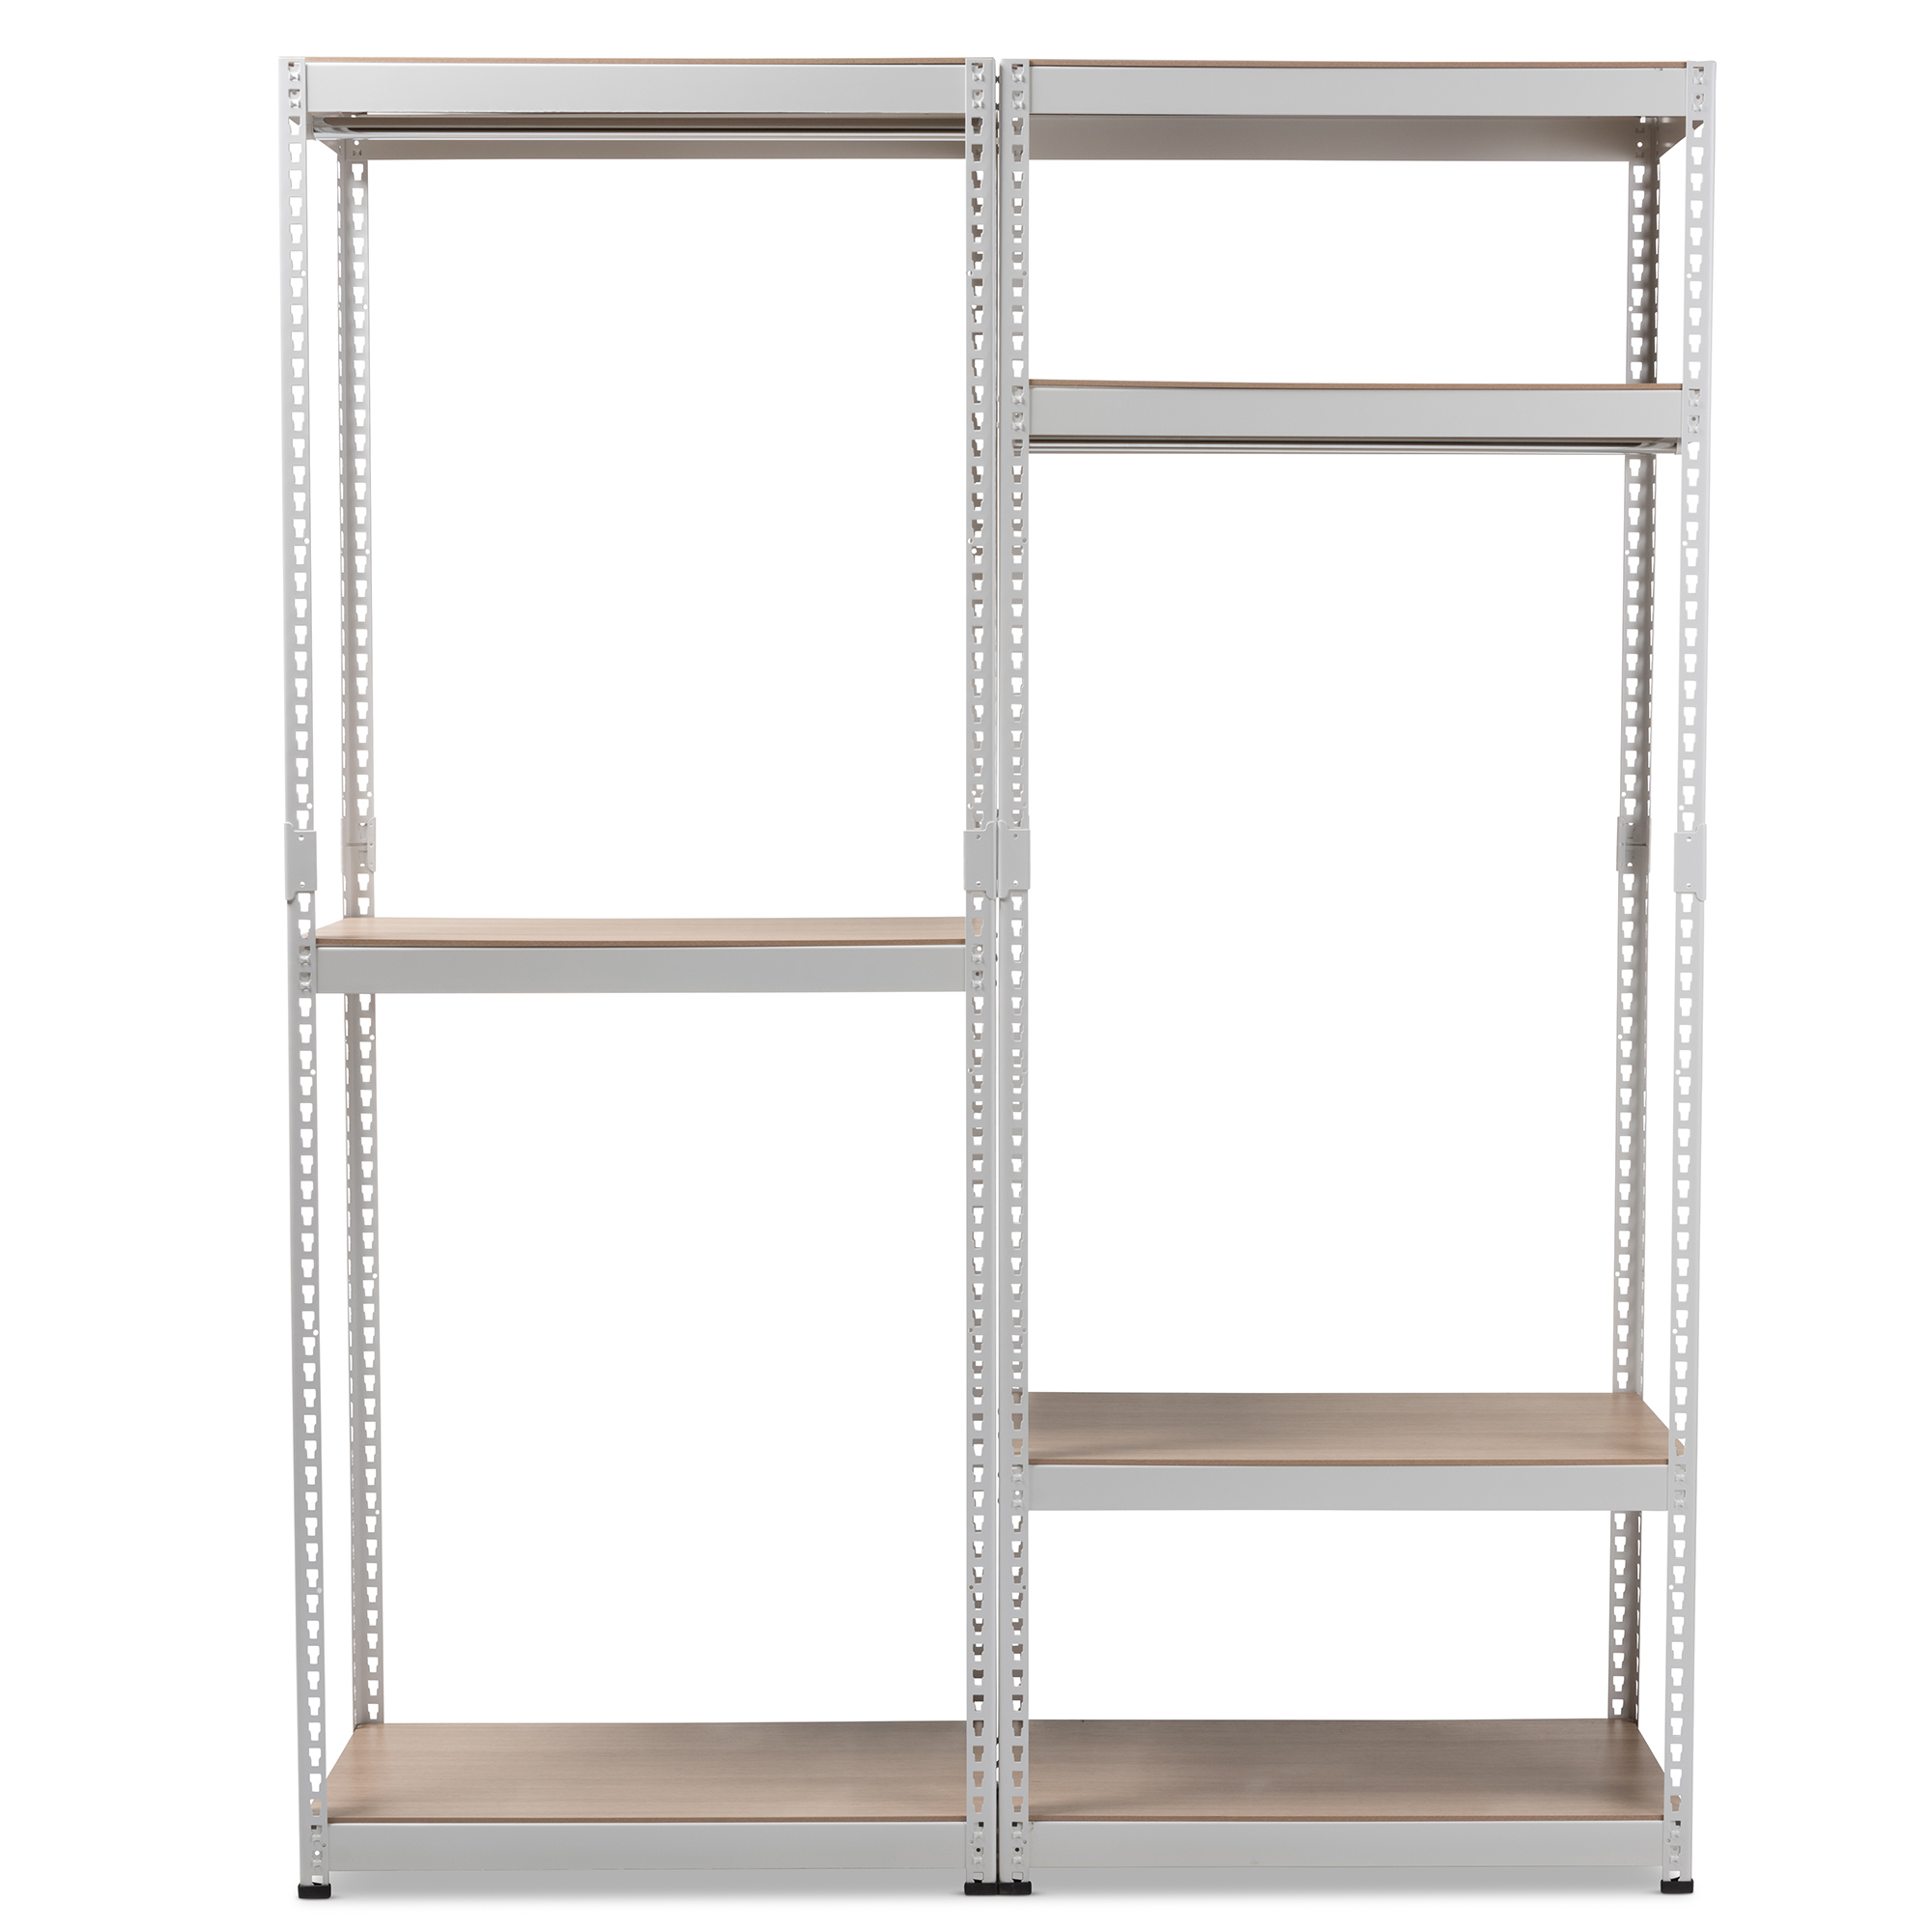 ... Baxton Studio Gavin White Metal 7 Shelf Closet Storage Racking  Organizer   IEWH06/WH09 ...